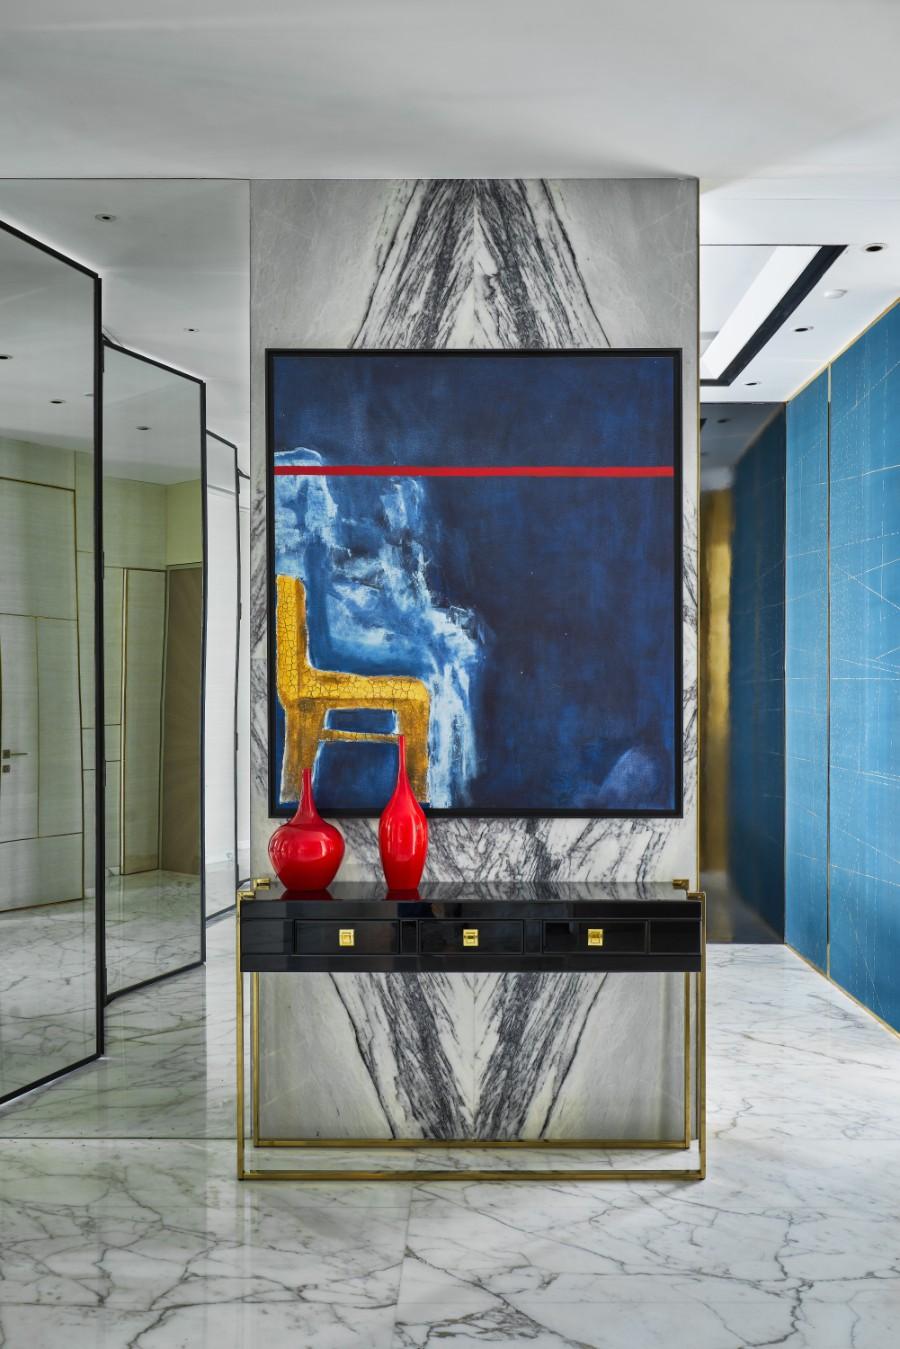 exclusive design Exclusive Design: Altamount Residence by Hirsch Bedner Associates Inside Altamount Residence by Hirsch Bedner Associates 1